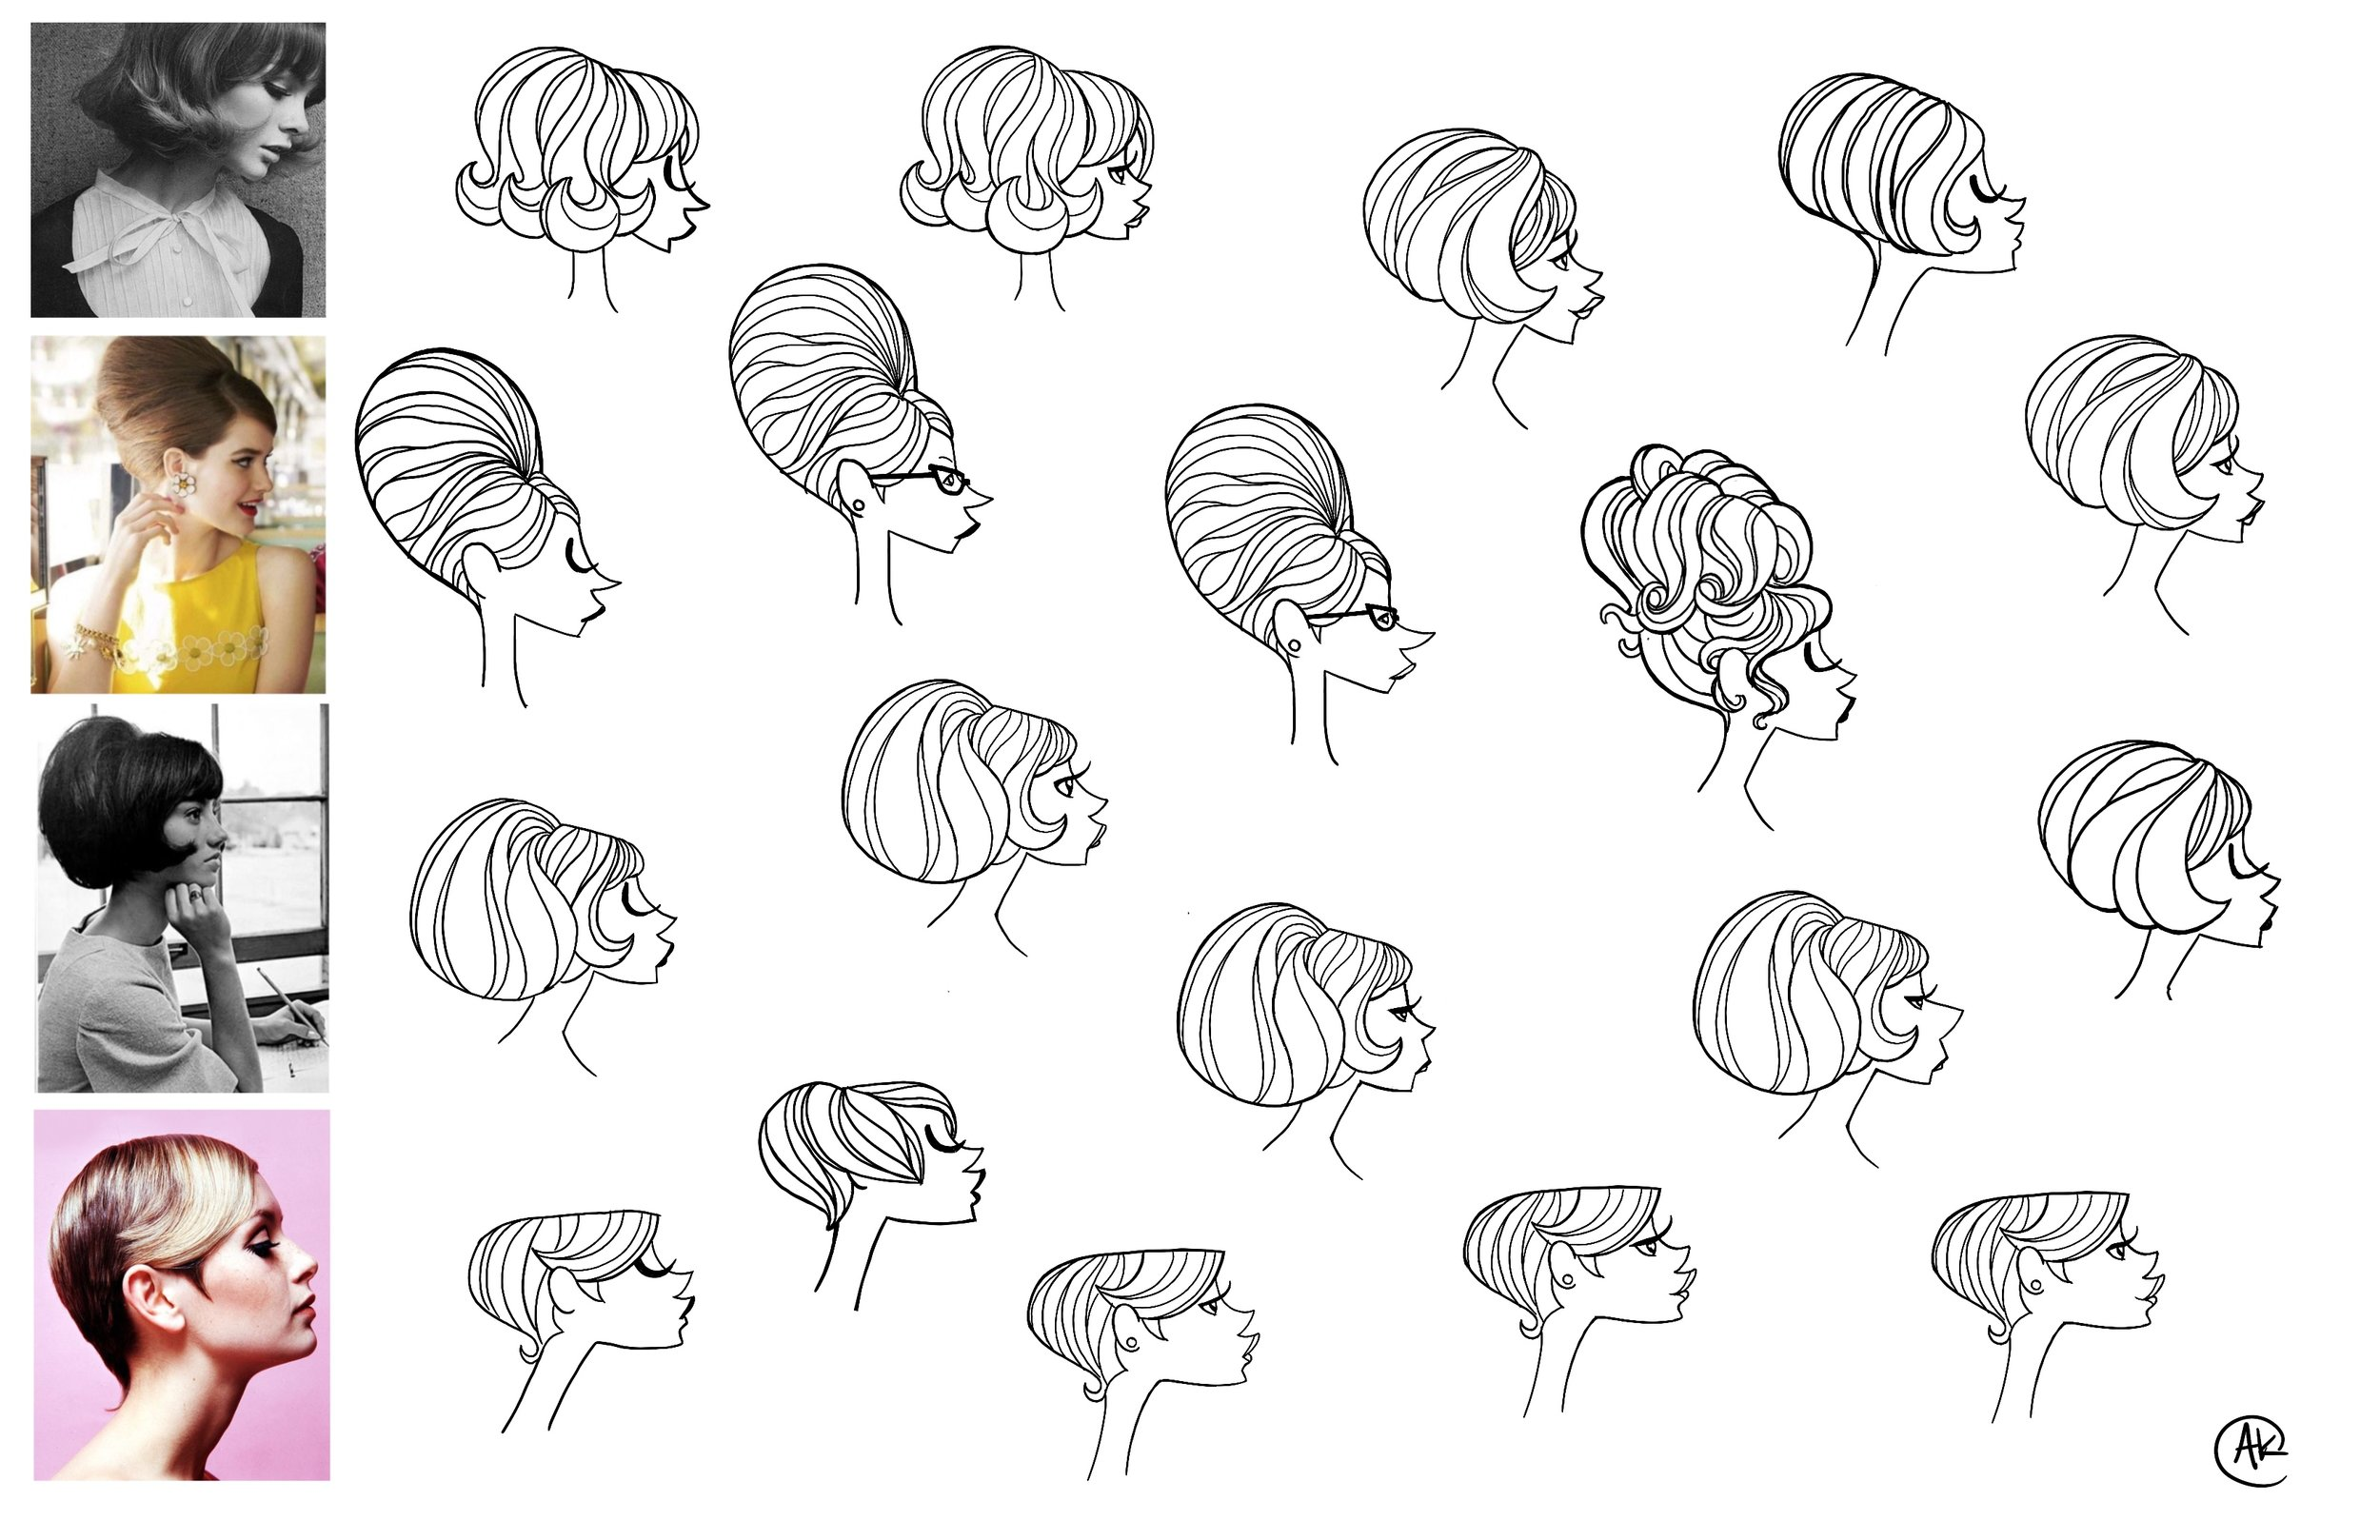 Head & hair explorations